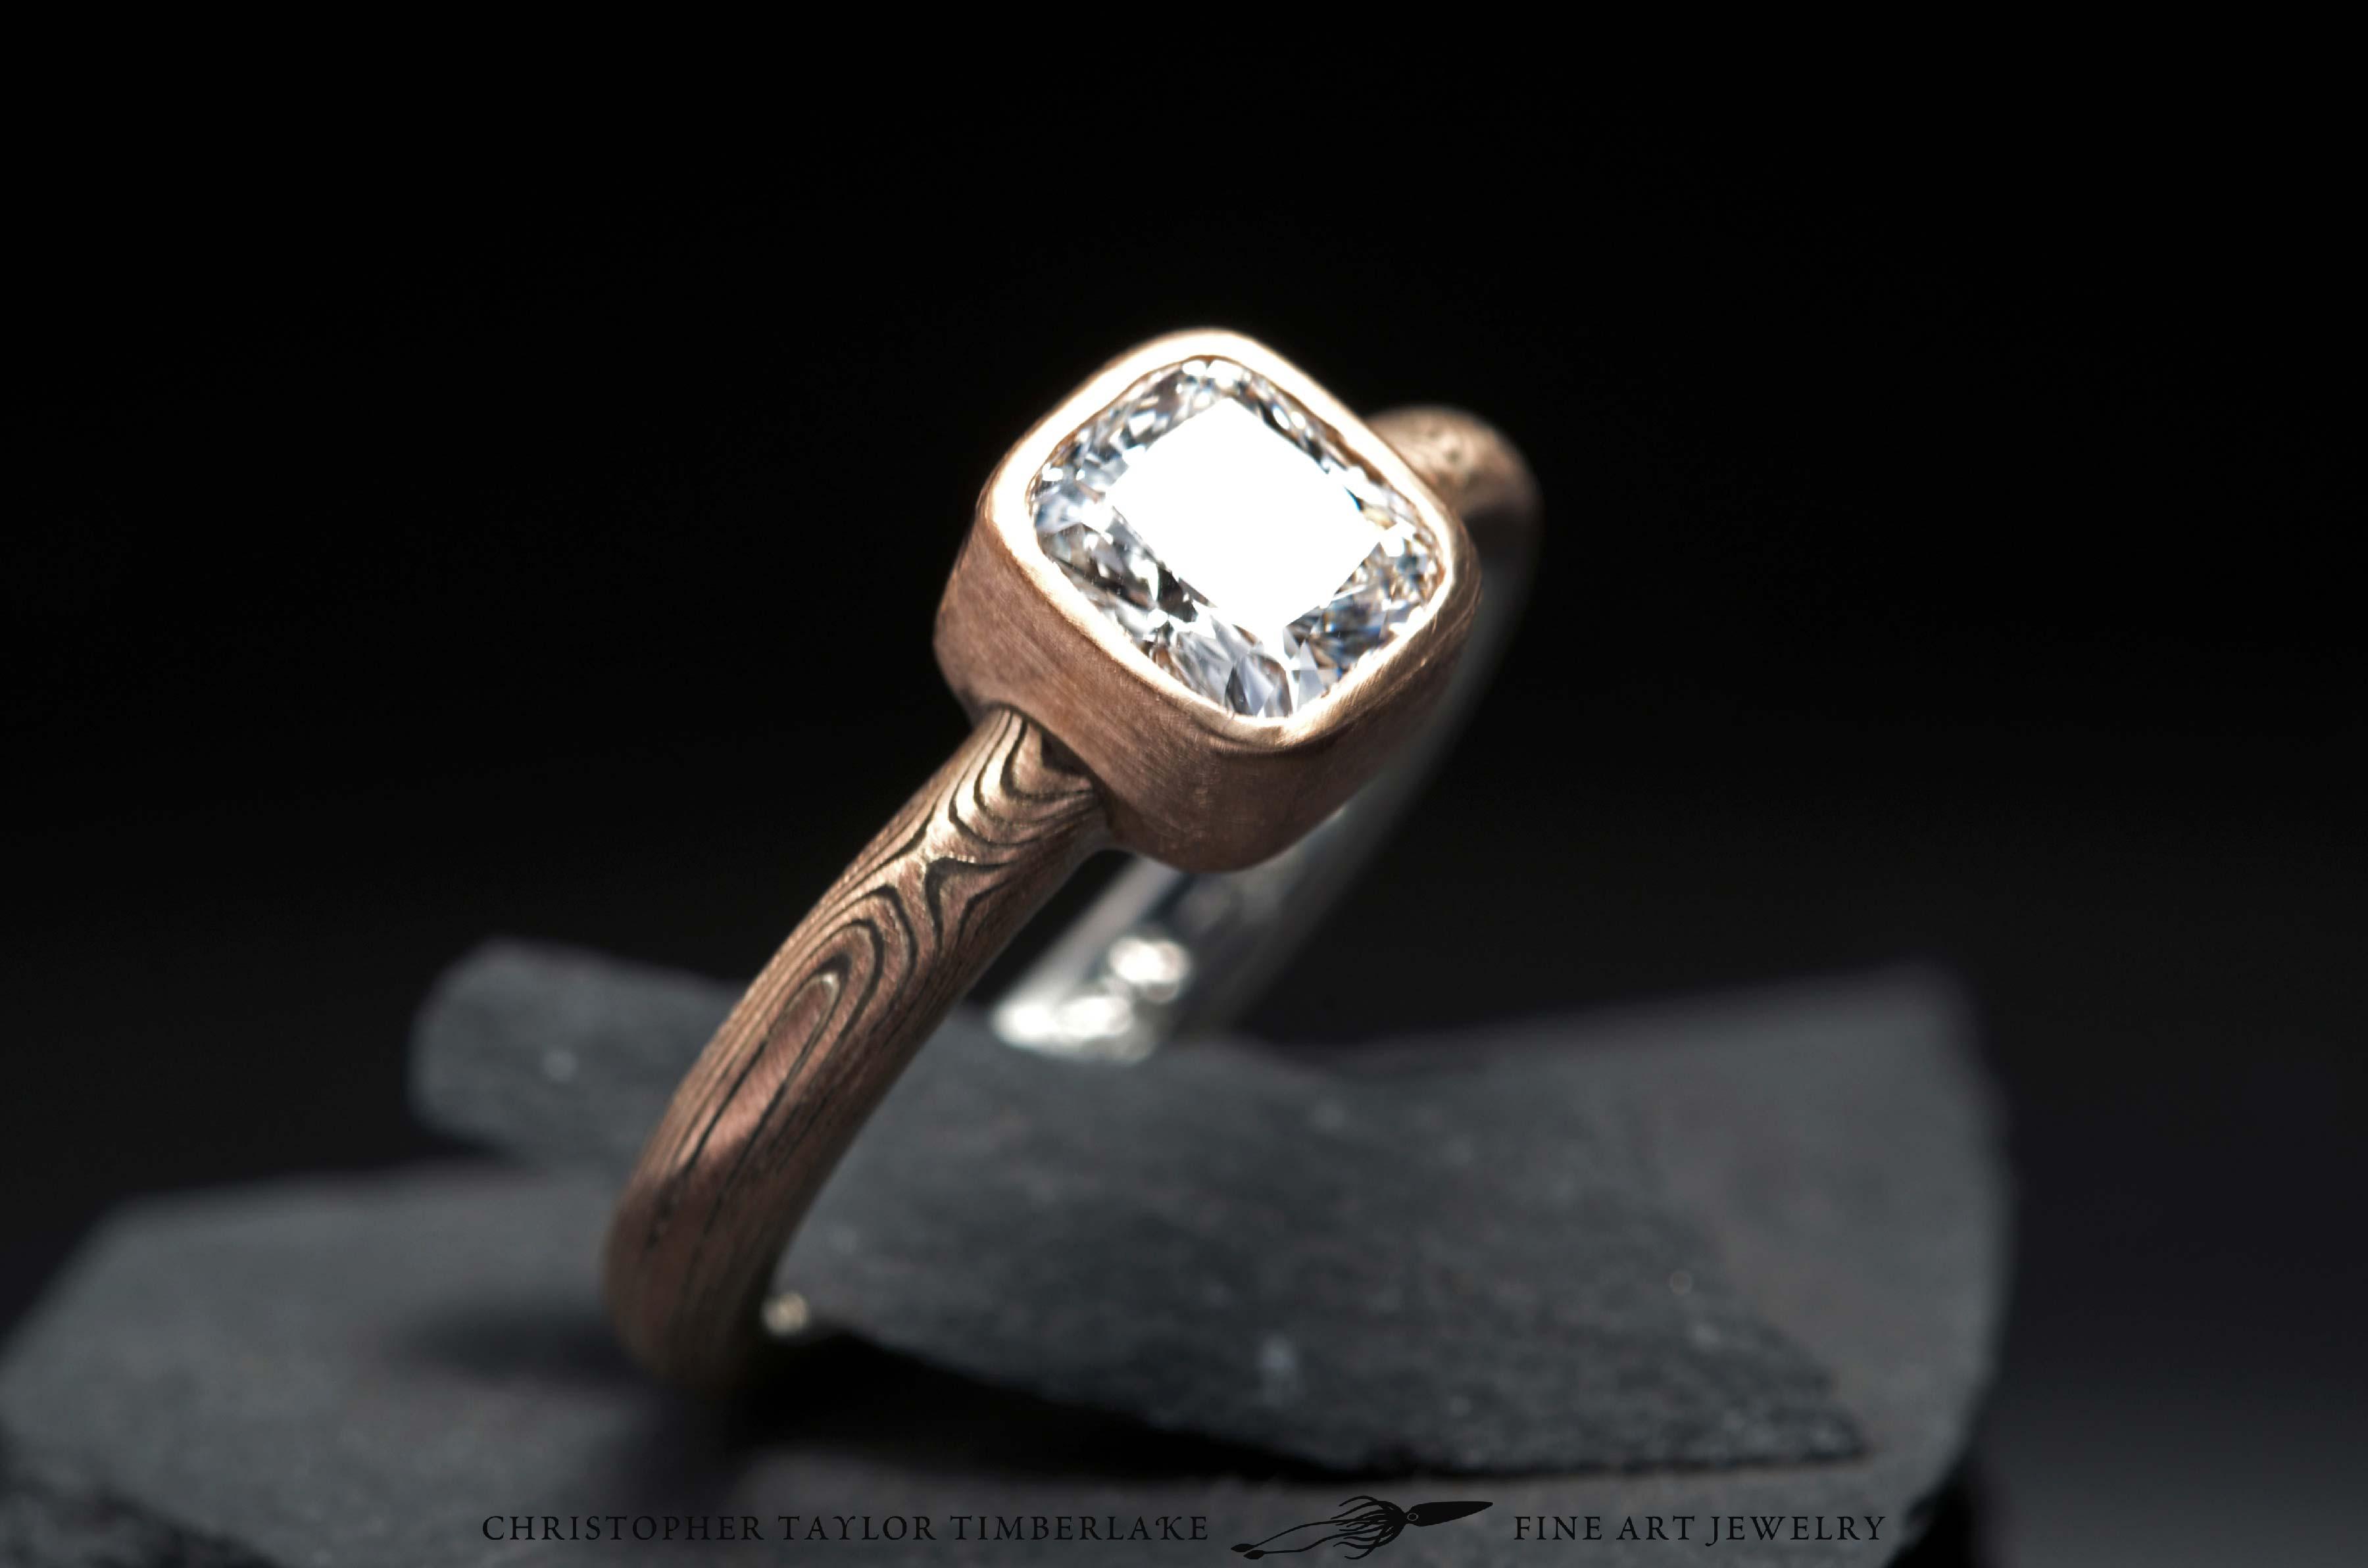 Mokume-(M83b)-14K-(karat)-rose-gold-and-sterling-silver,-0.75CT-cushion-cut-diamond-in-18K-red-bezel,-etched,-woodgrain-2.5mm-6